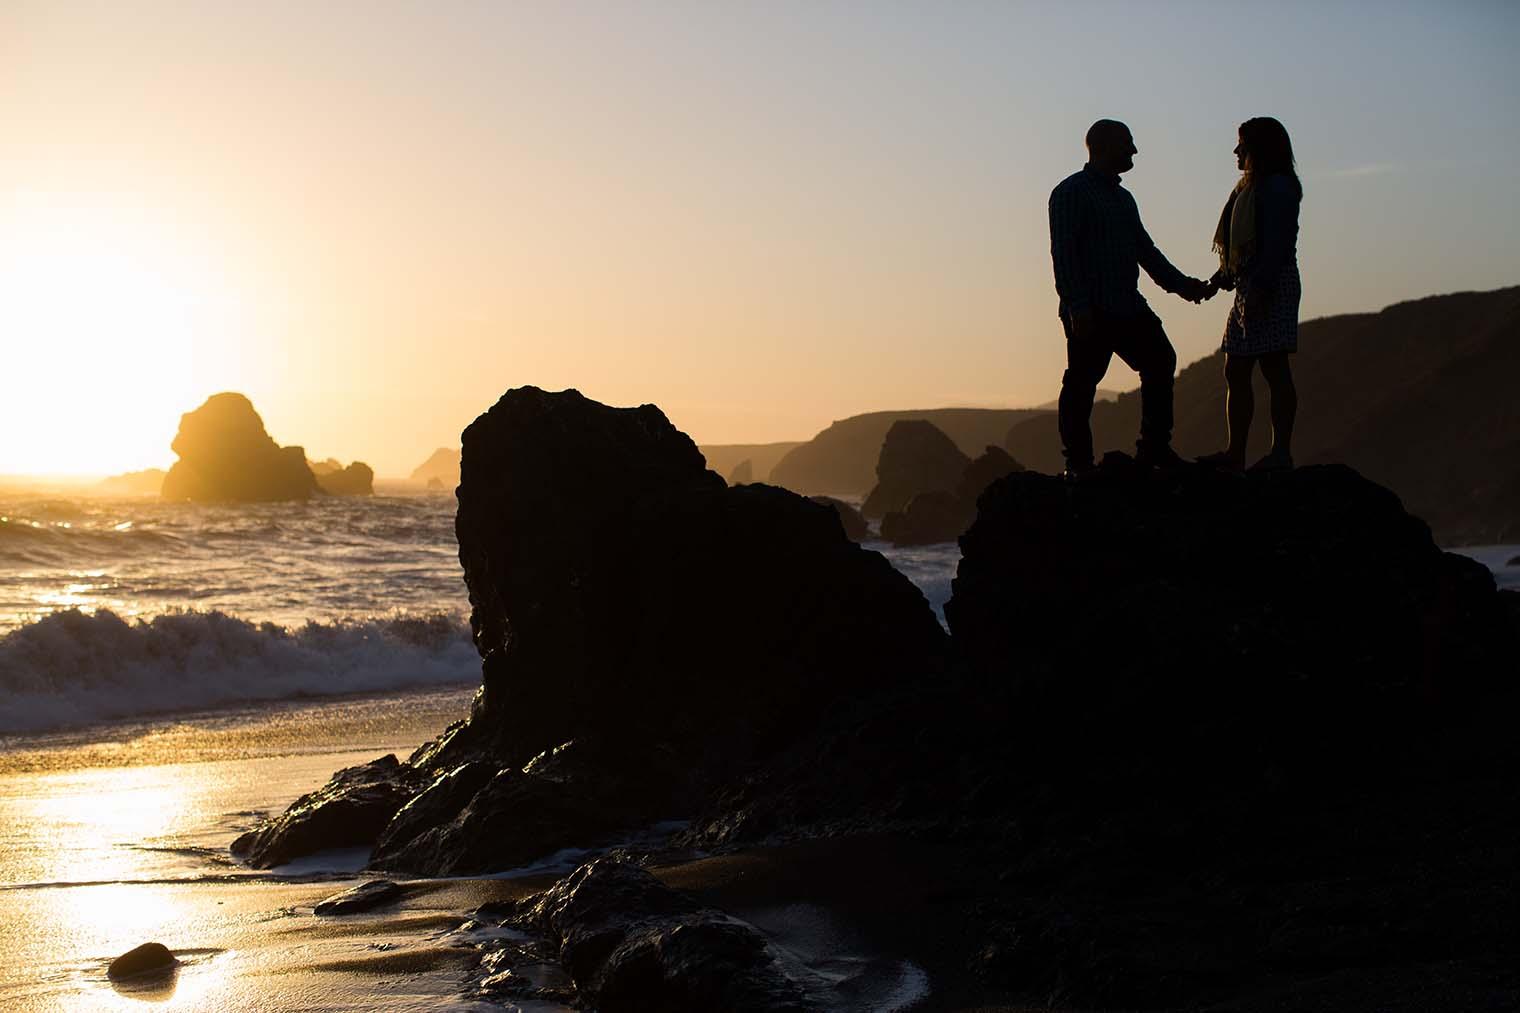 proposal captured at sunset